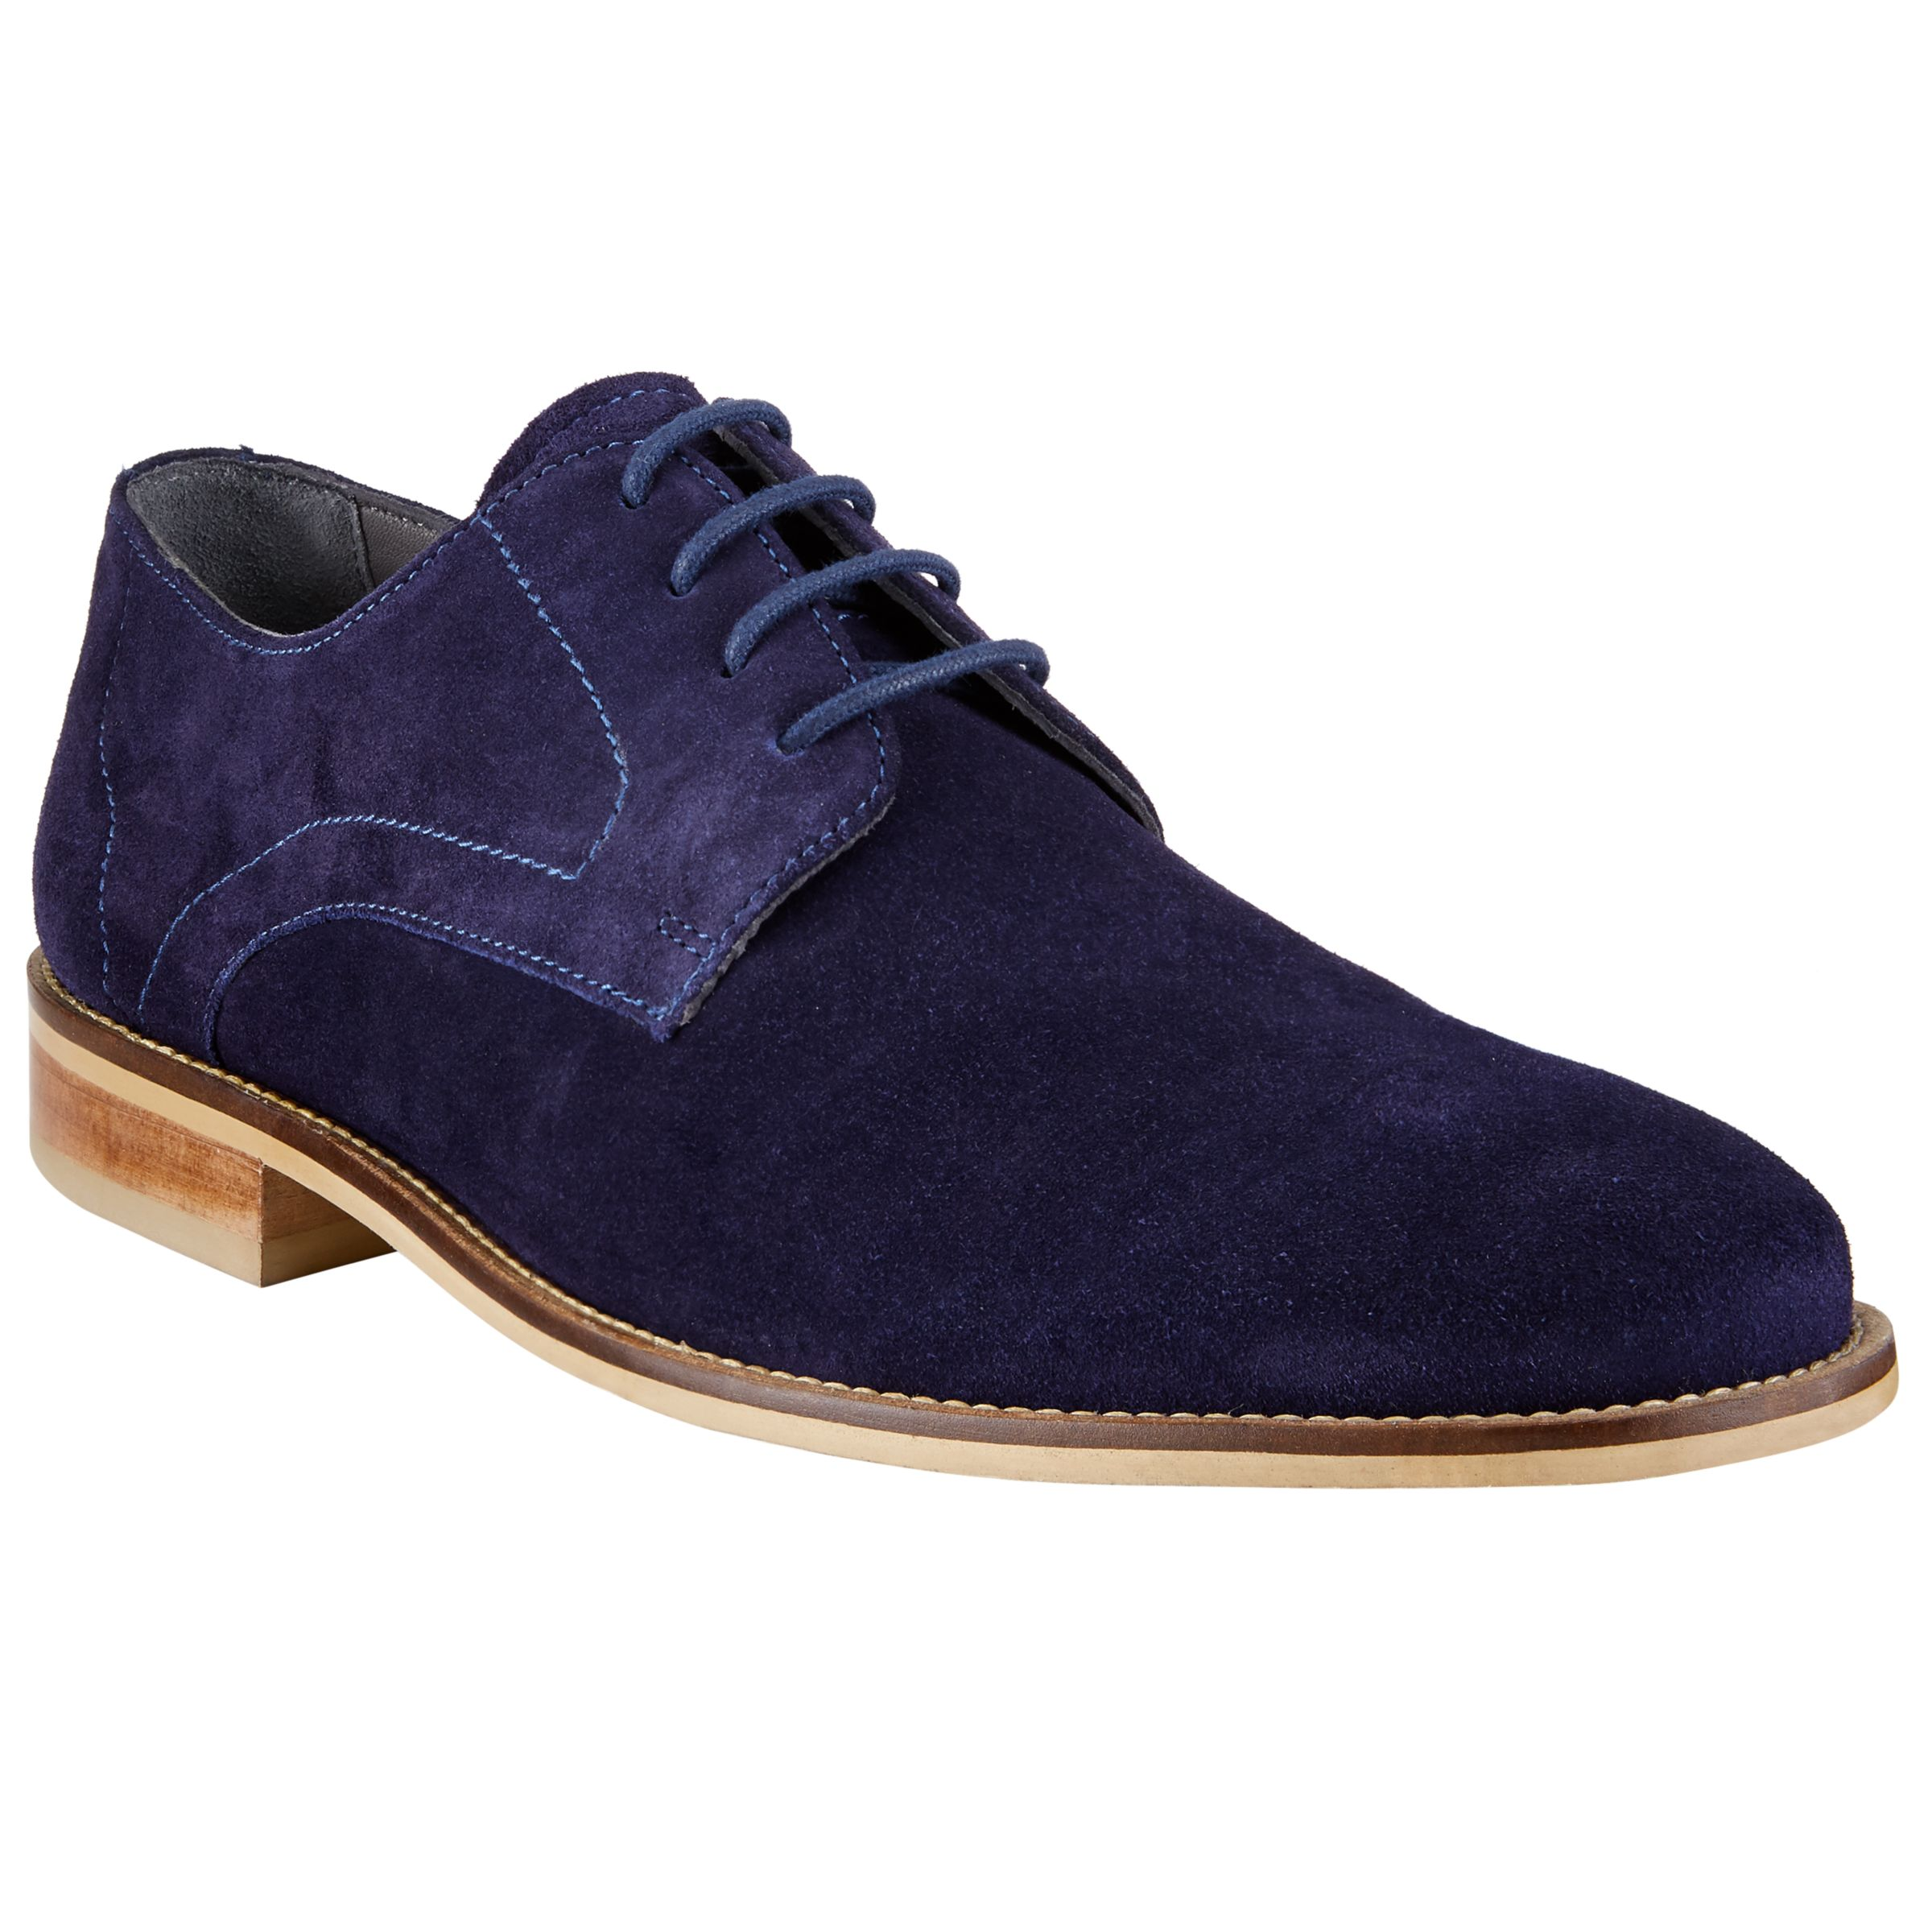 Kin by John Lewis Kin by John Lewis Bobby ll Derby Shoes